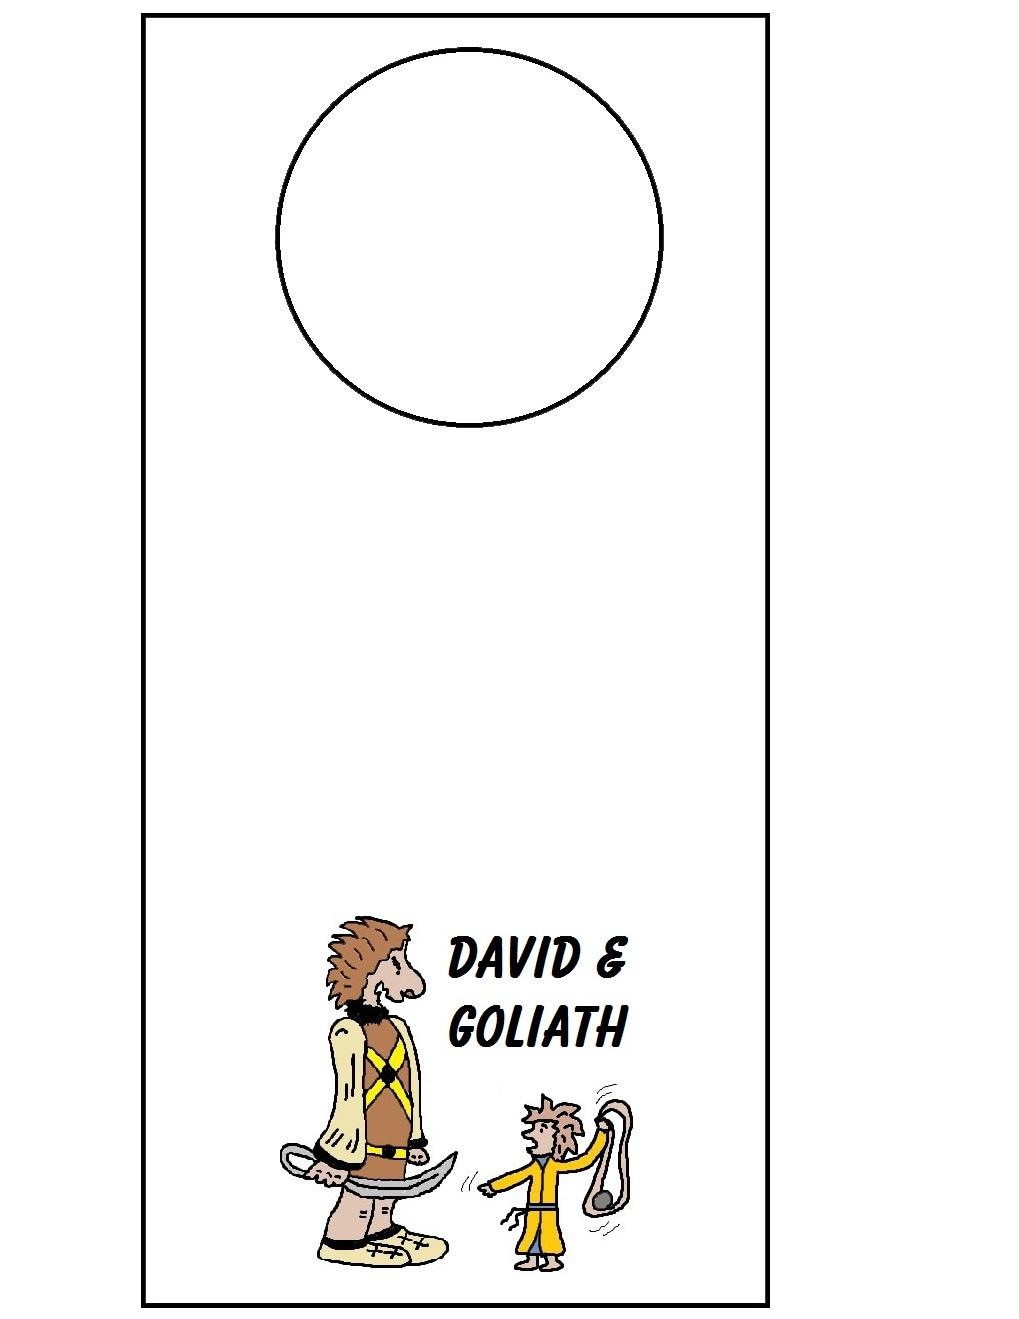 David and goliath doorknob hanger for David and goliath craft